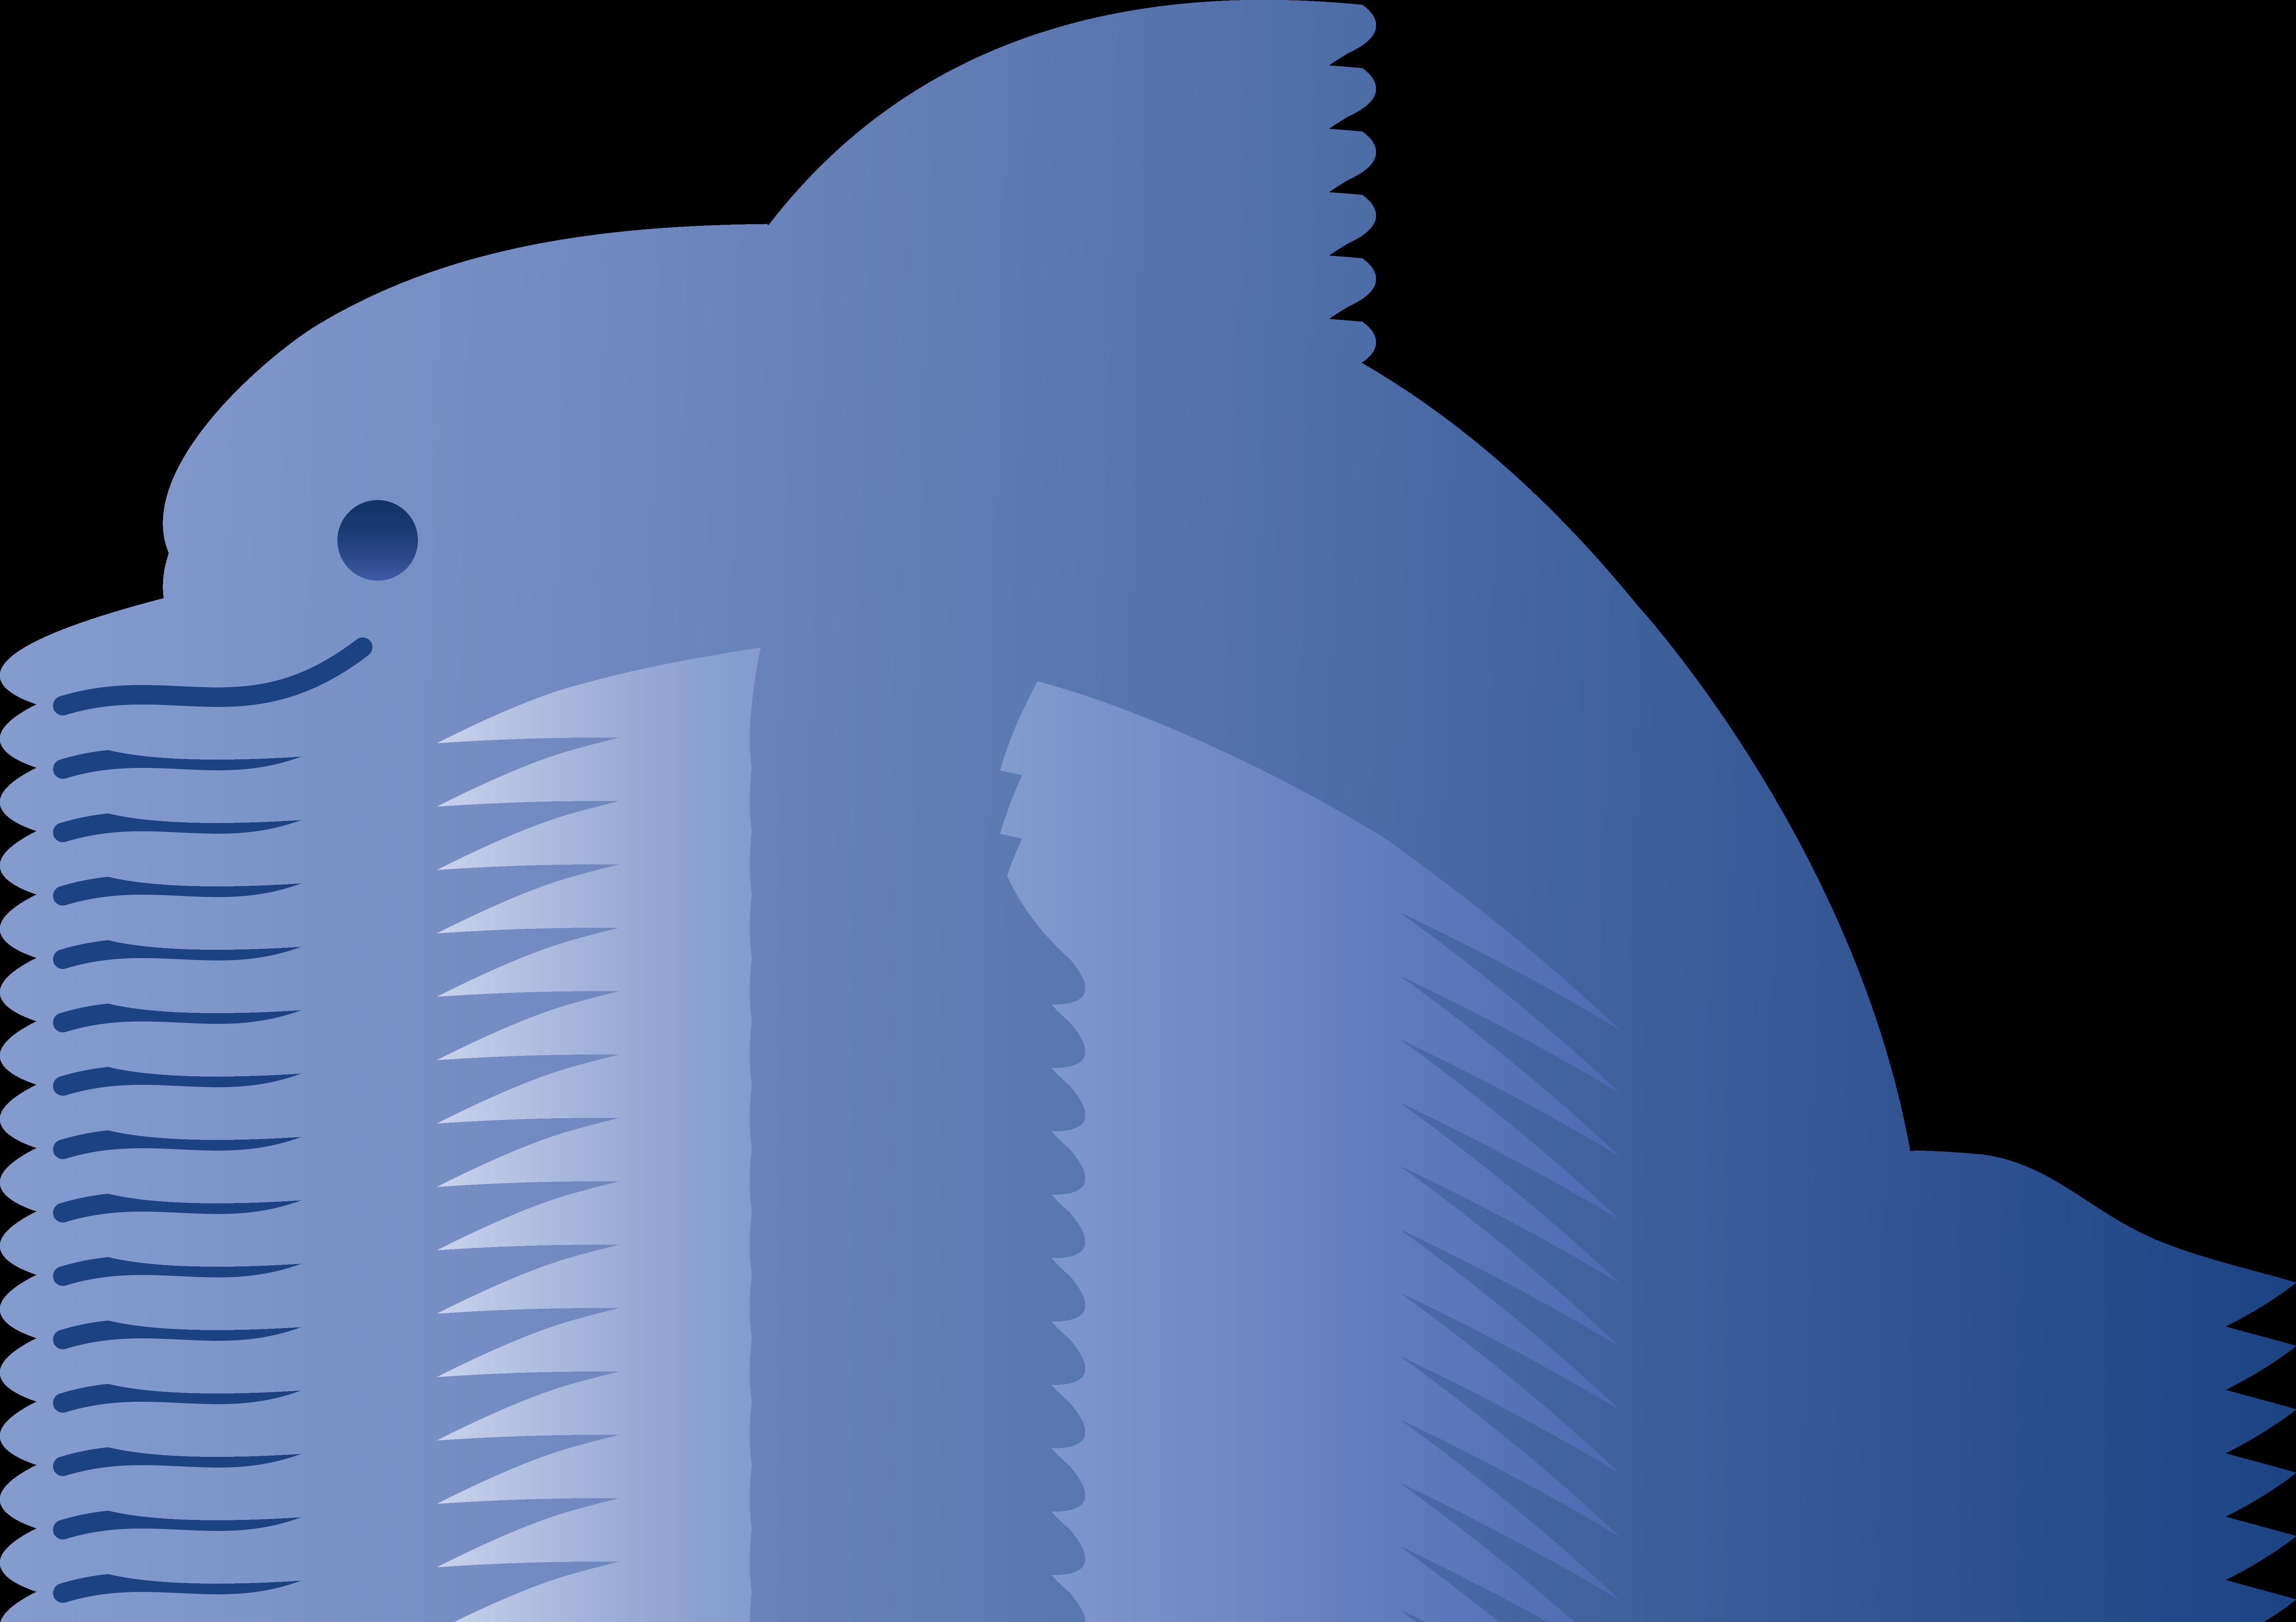 dolphin clip art outline clipart panda free clipart images rh clipartpanda com free dolphin clipart illustrations free dolphin clipart black and white